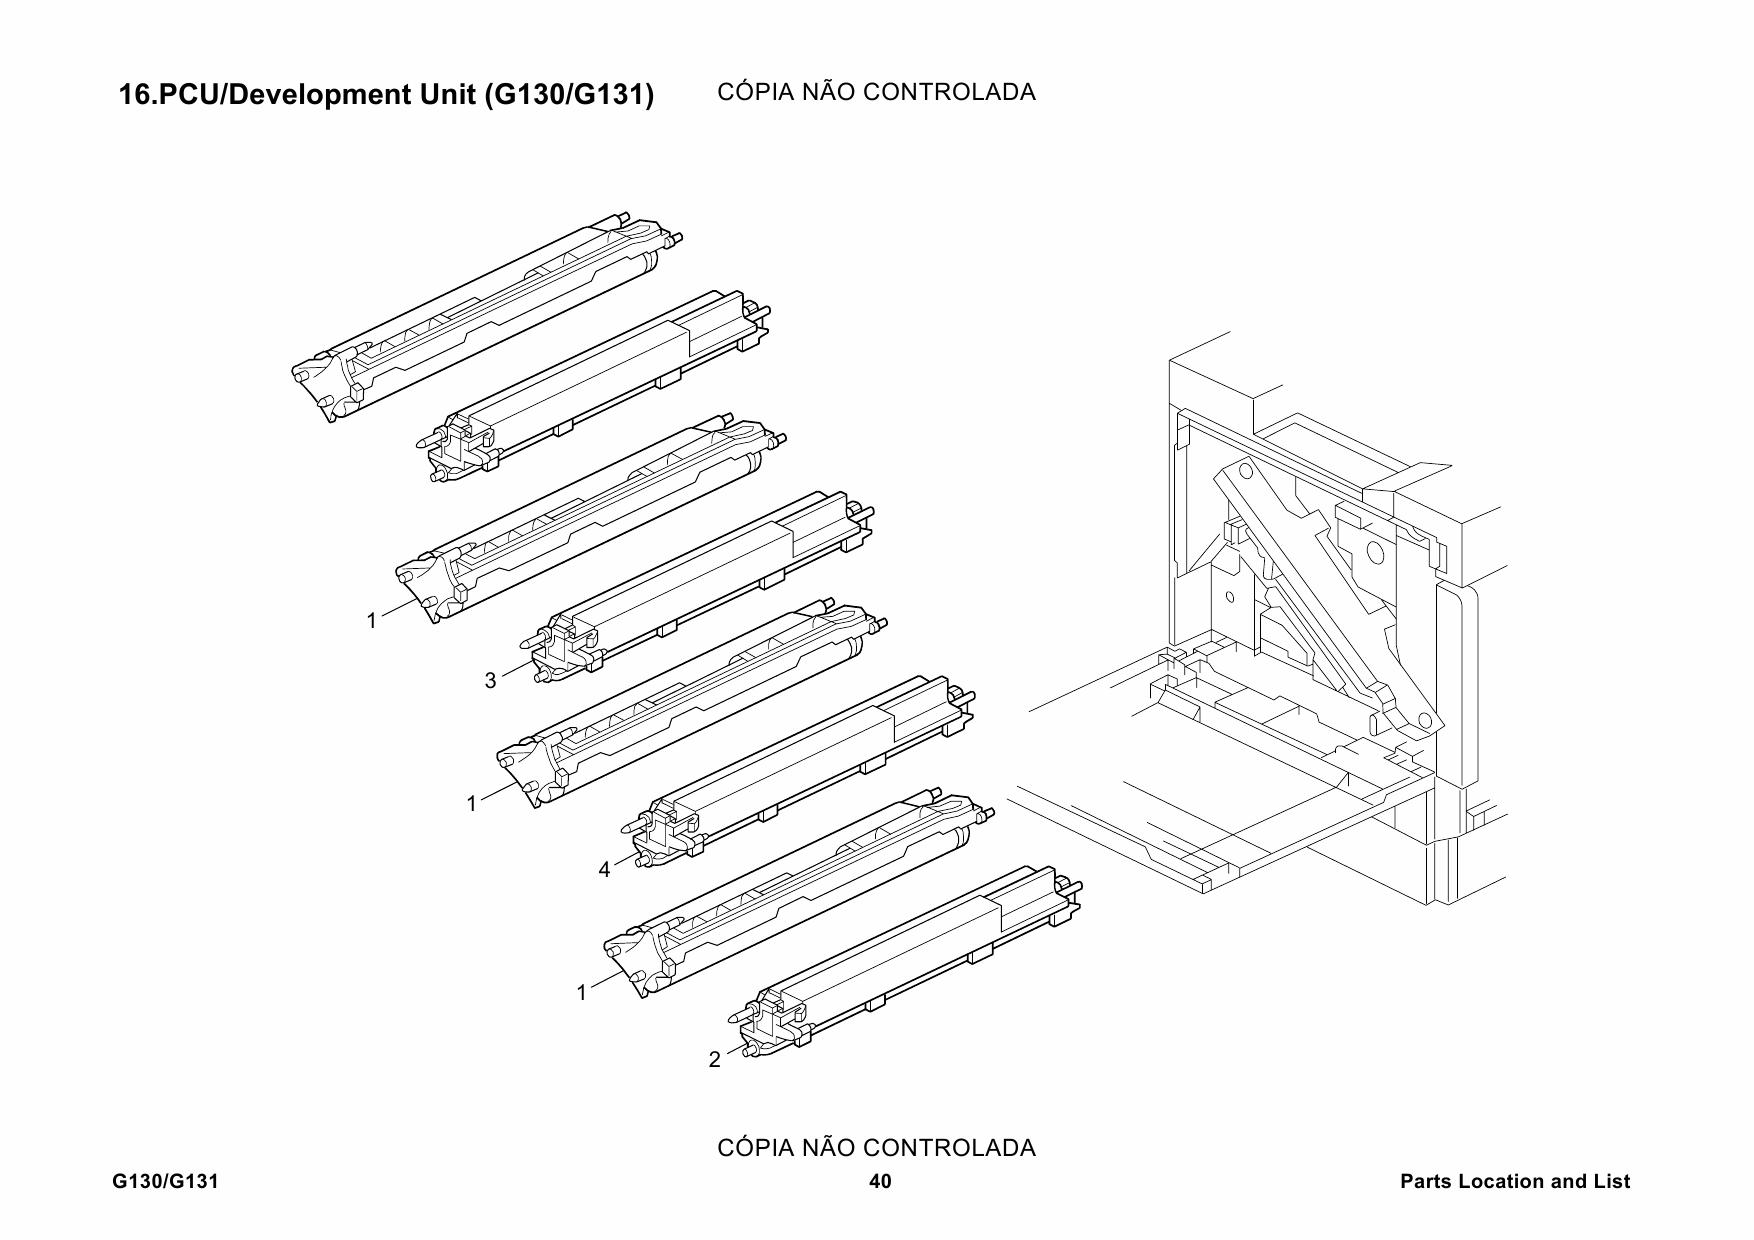 Ricoh Aficio Cl G130 G131 Parts Catalog